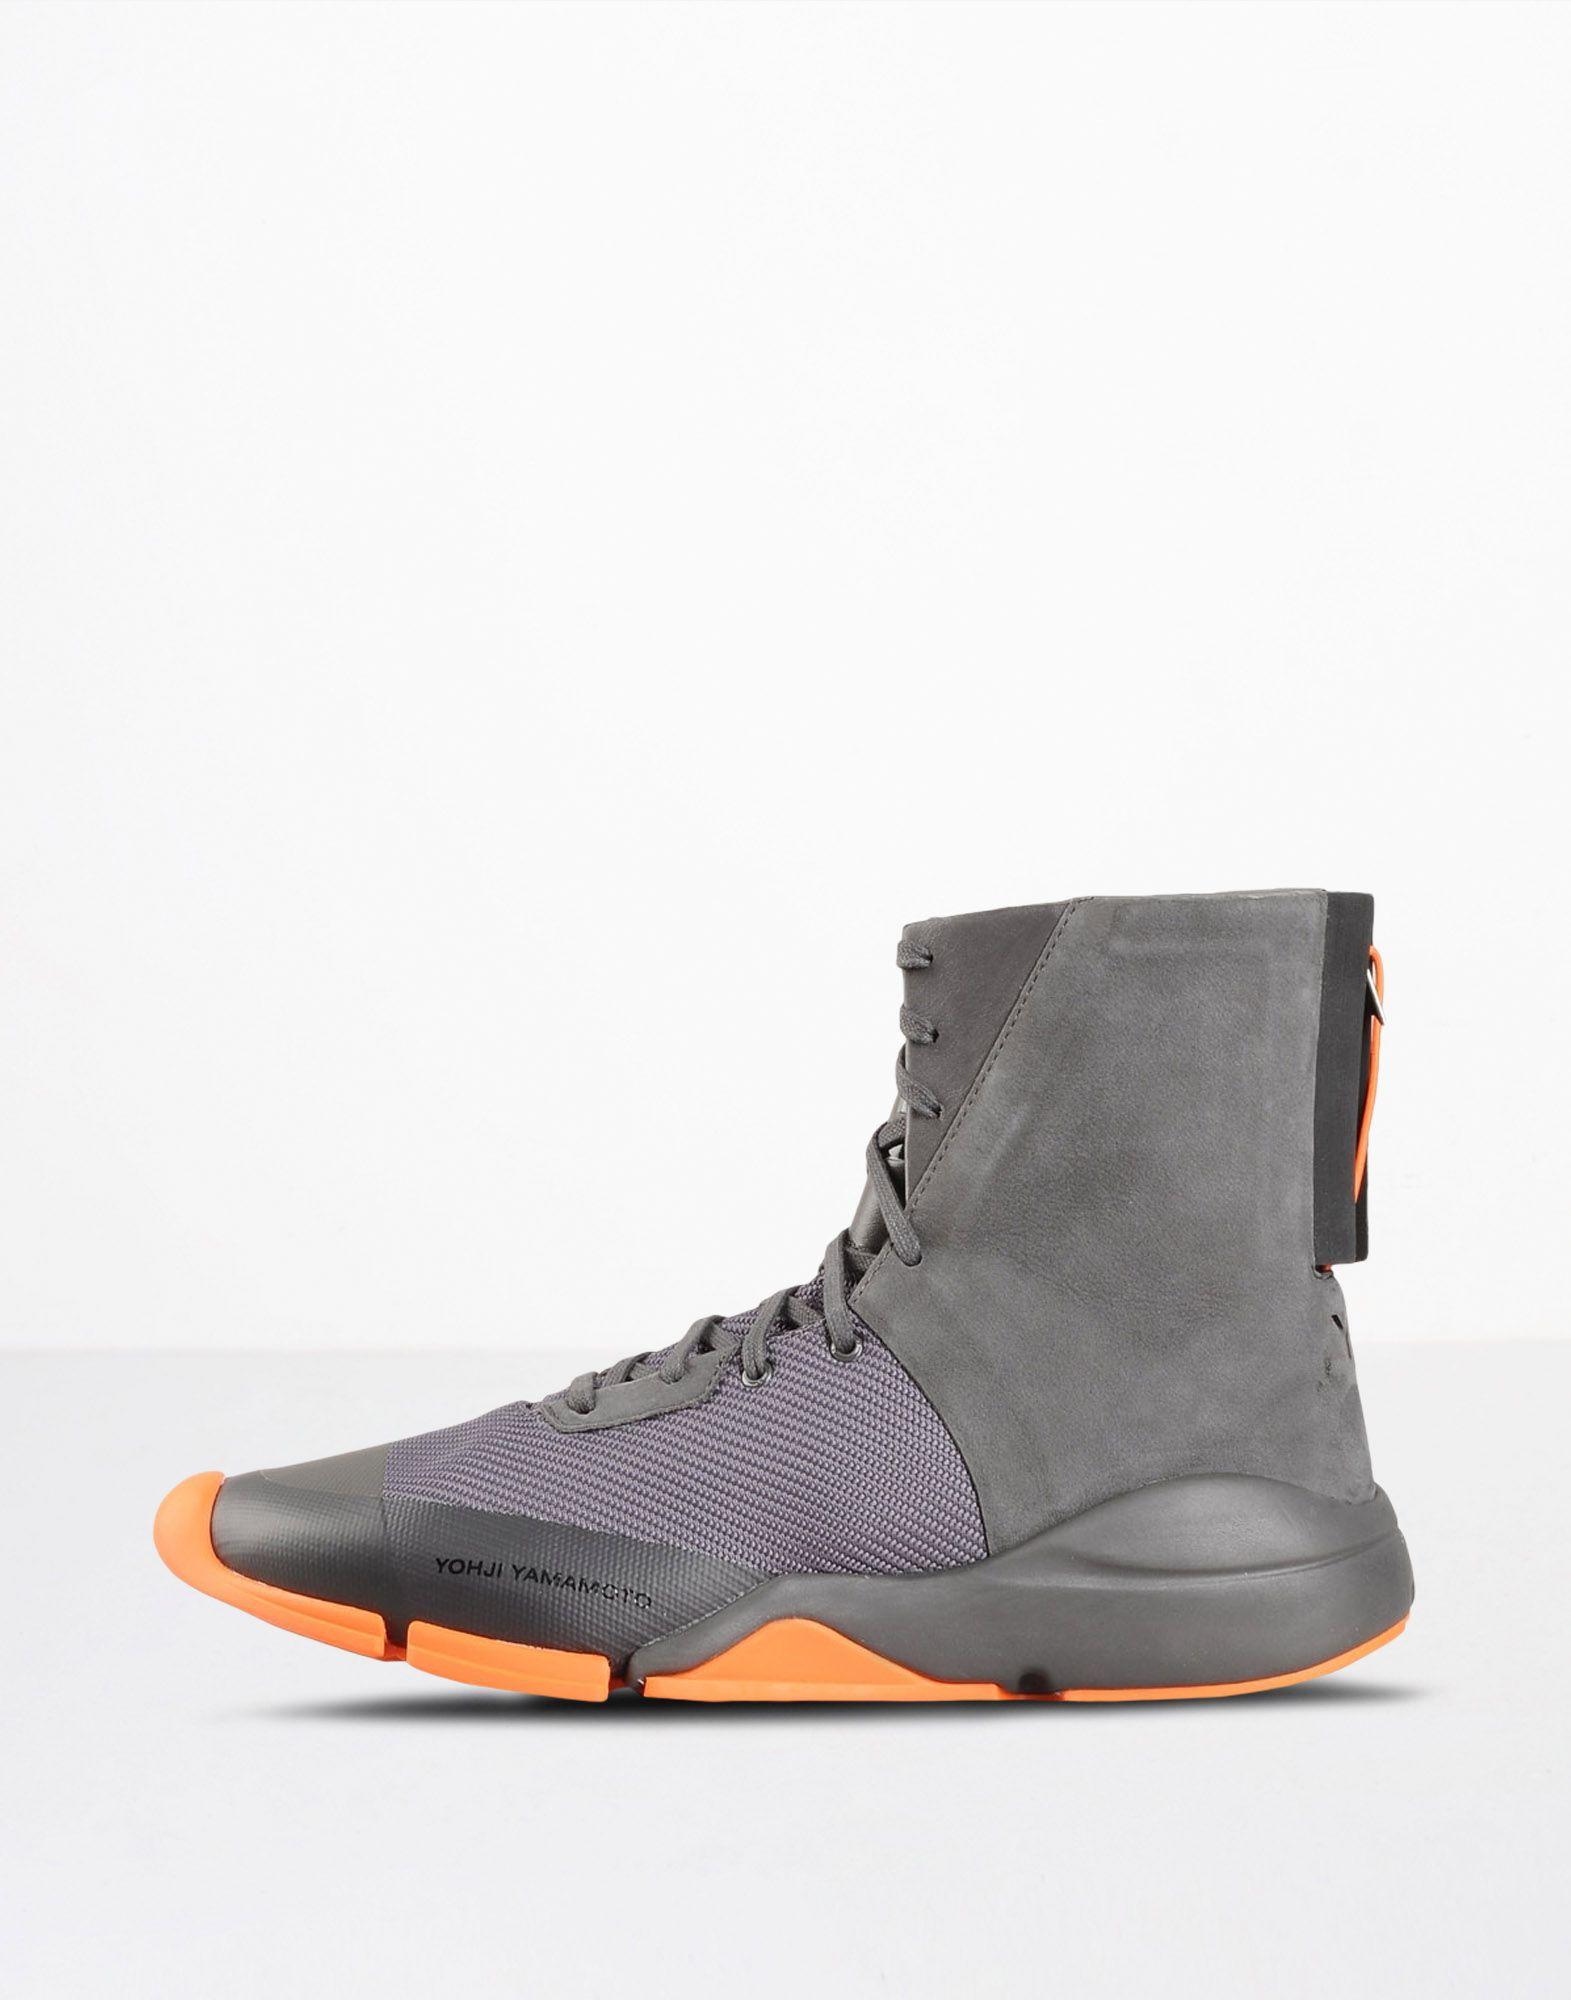 Y-3 Future Zip High Sneaker t8mUp1Nfko